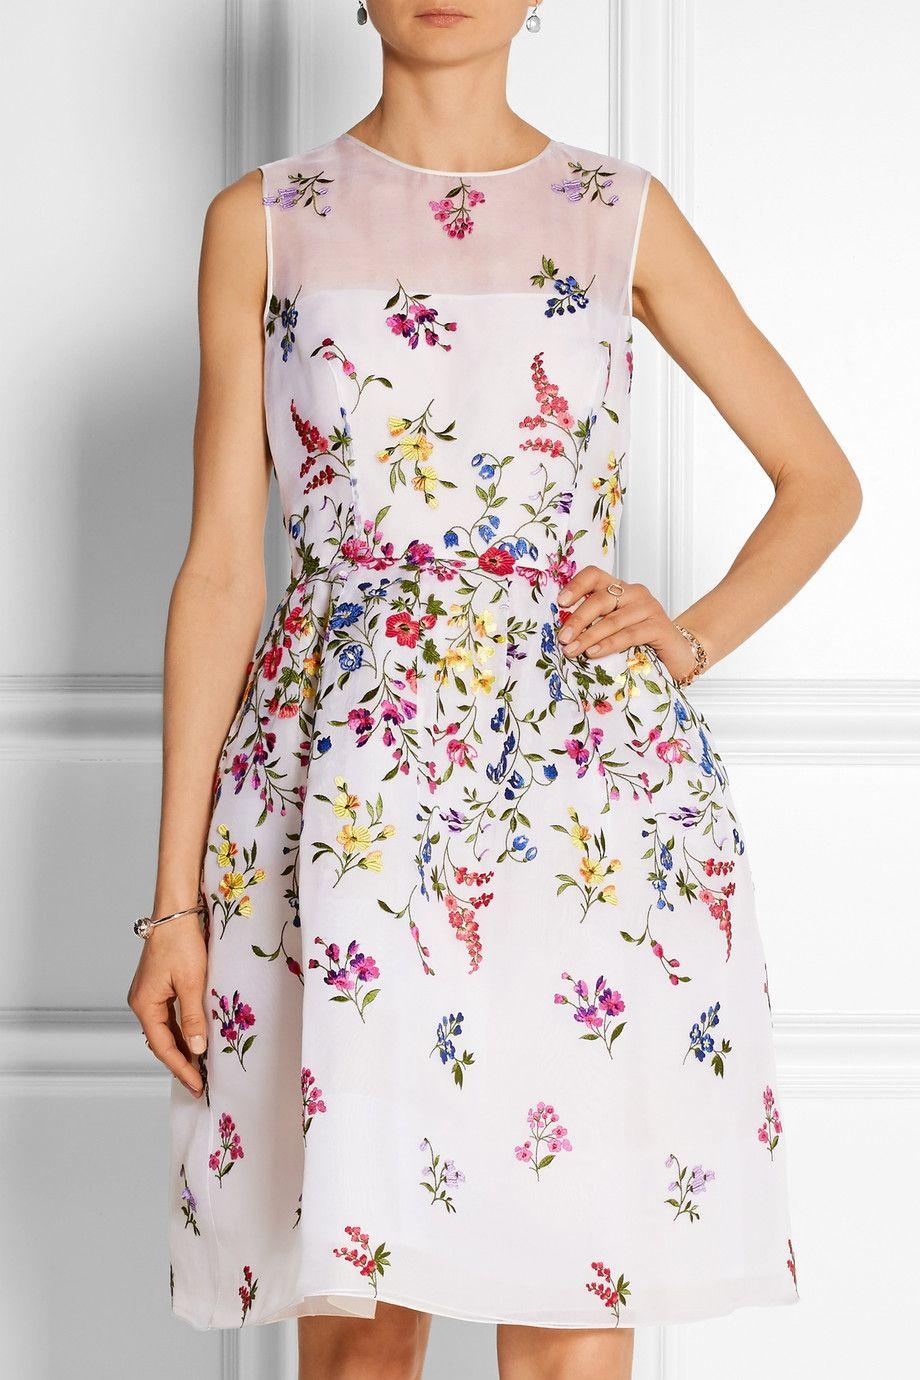 Oscar de la renta embroidered silkorganza dress netaporter